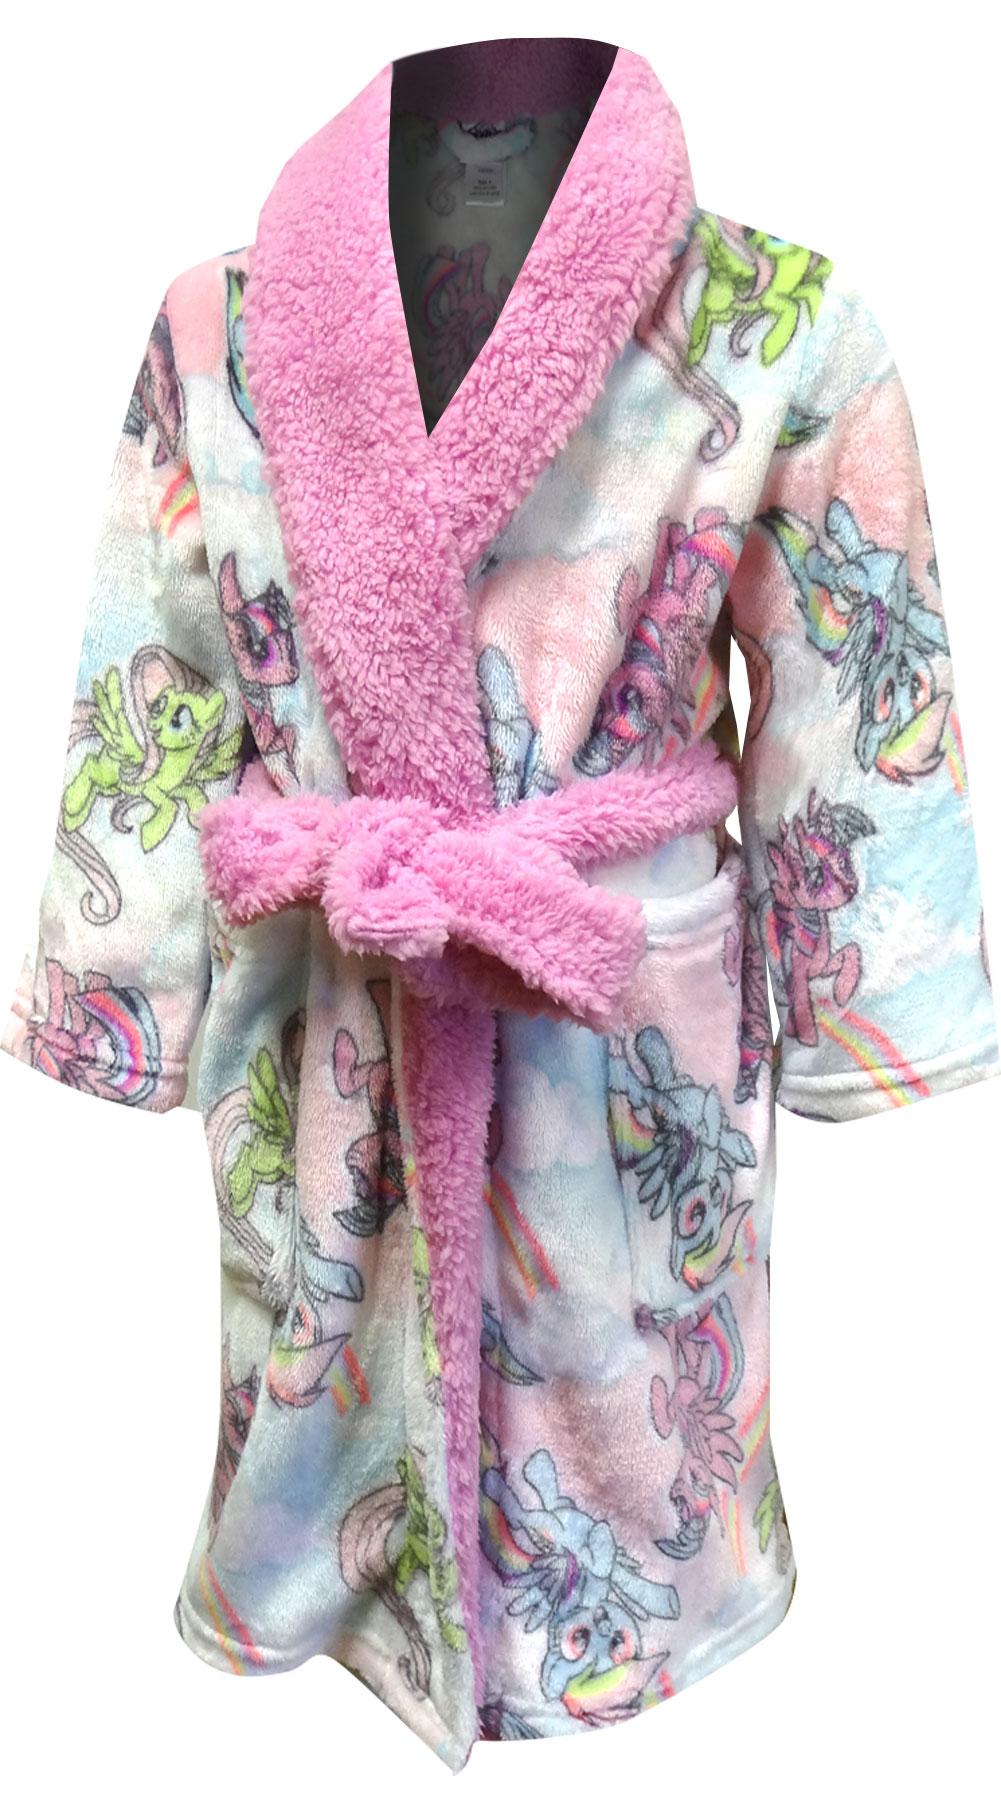 Image of My Little Pony Soft Pastel Plush Robe for girls